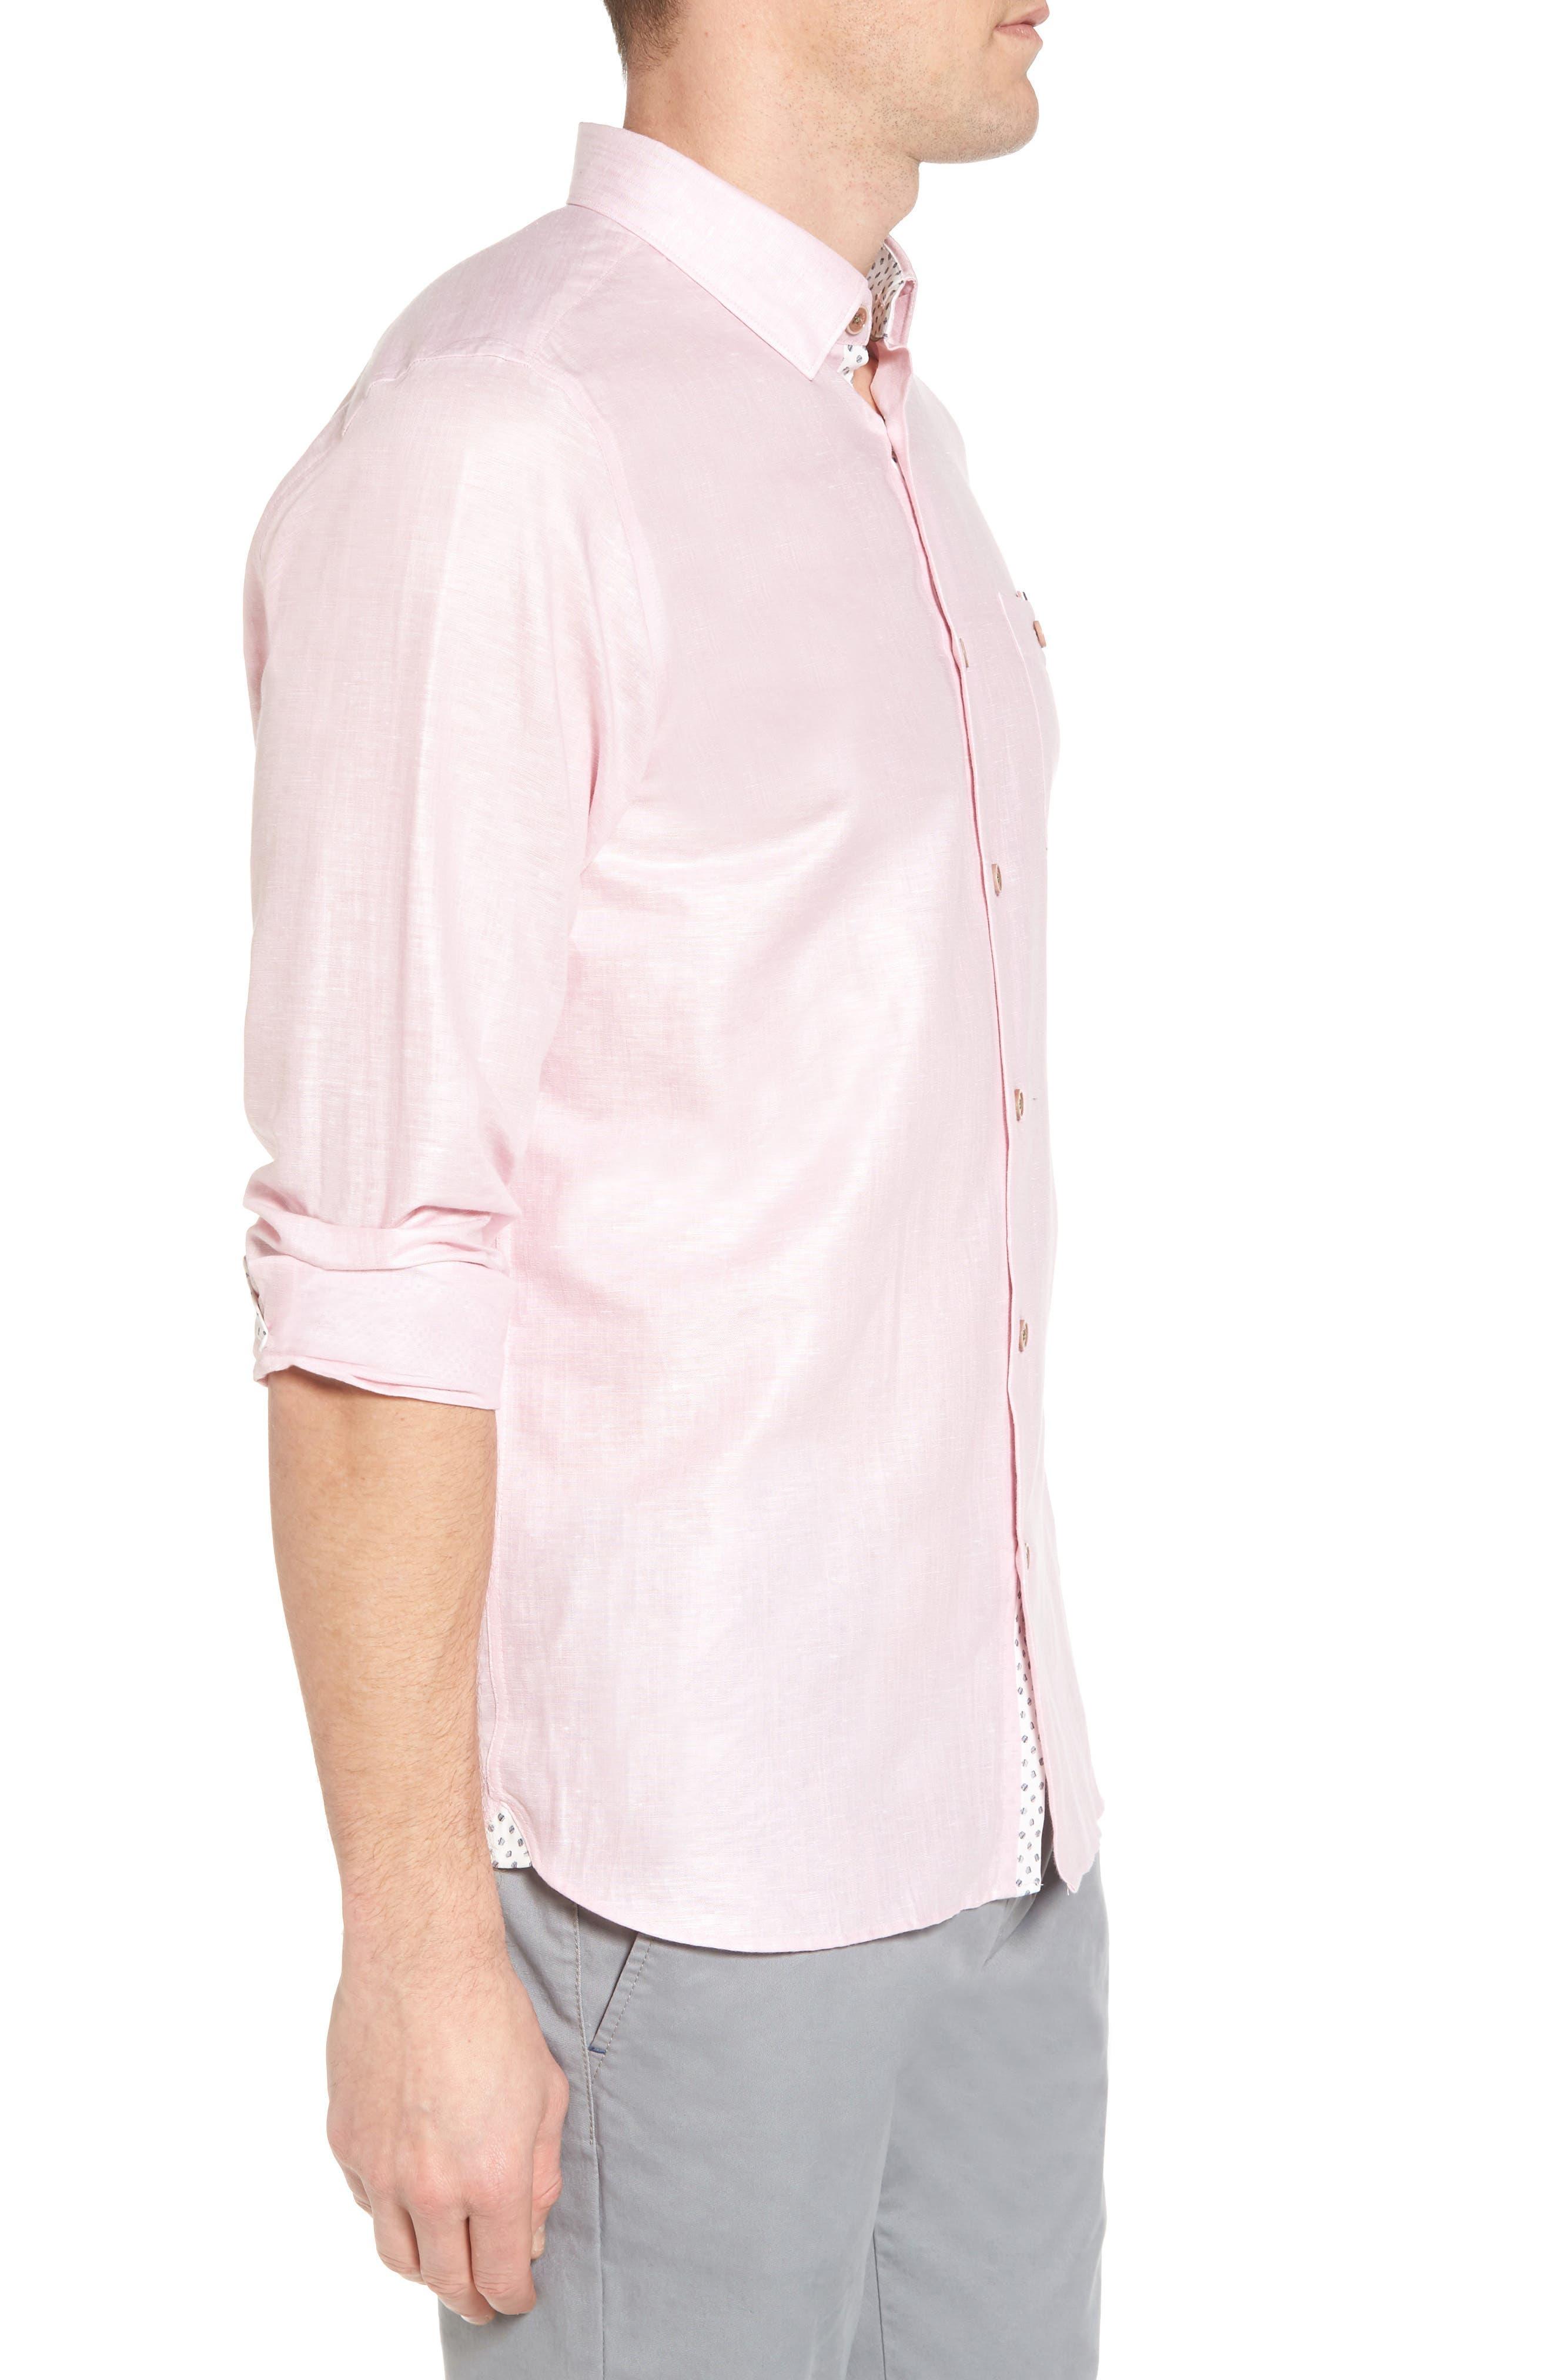 Linlins Herringbone Cotton & Linen Sport Shirt,                             Alternate thumbnail 15, color,